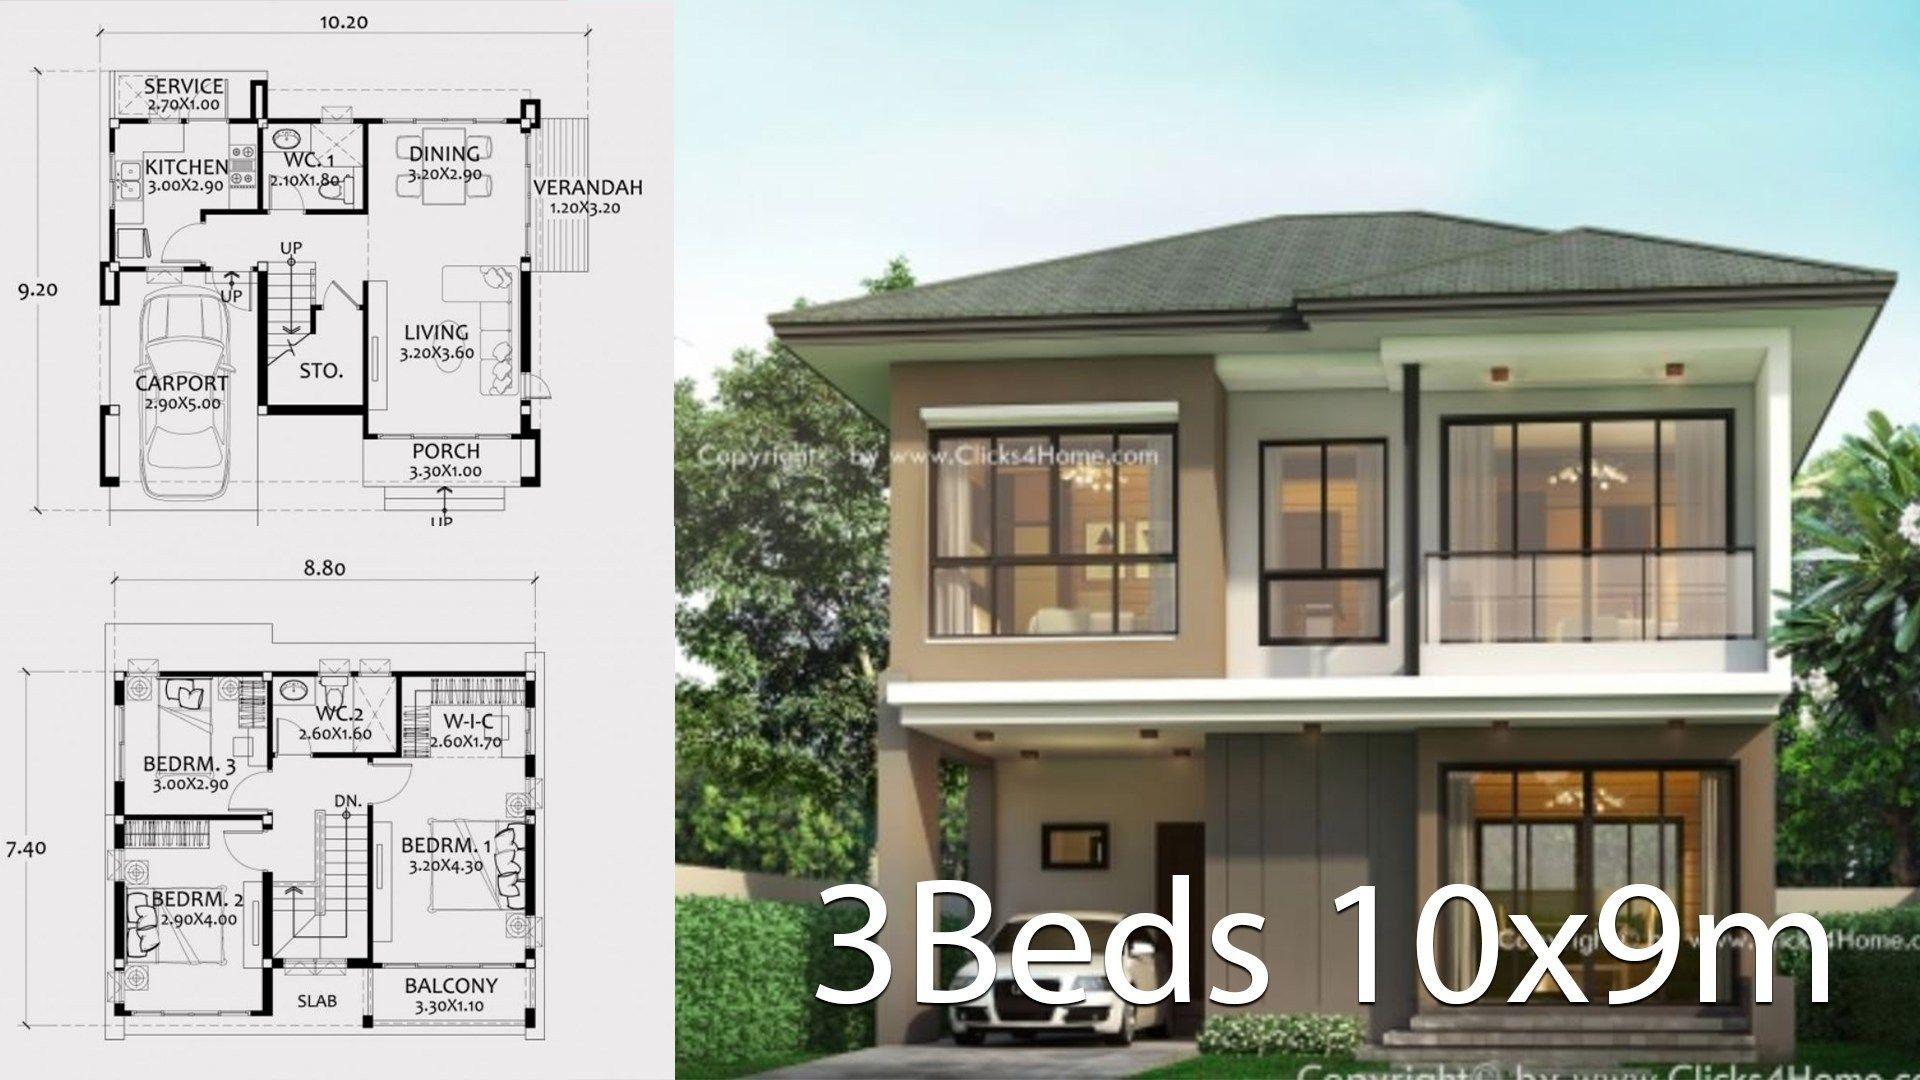 Home Design Plan 10x9m With 3 Bedrooms Home Design With Plan Home Design Plan Home Design Plans House Design